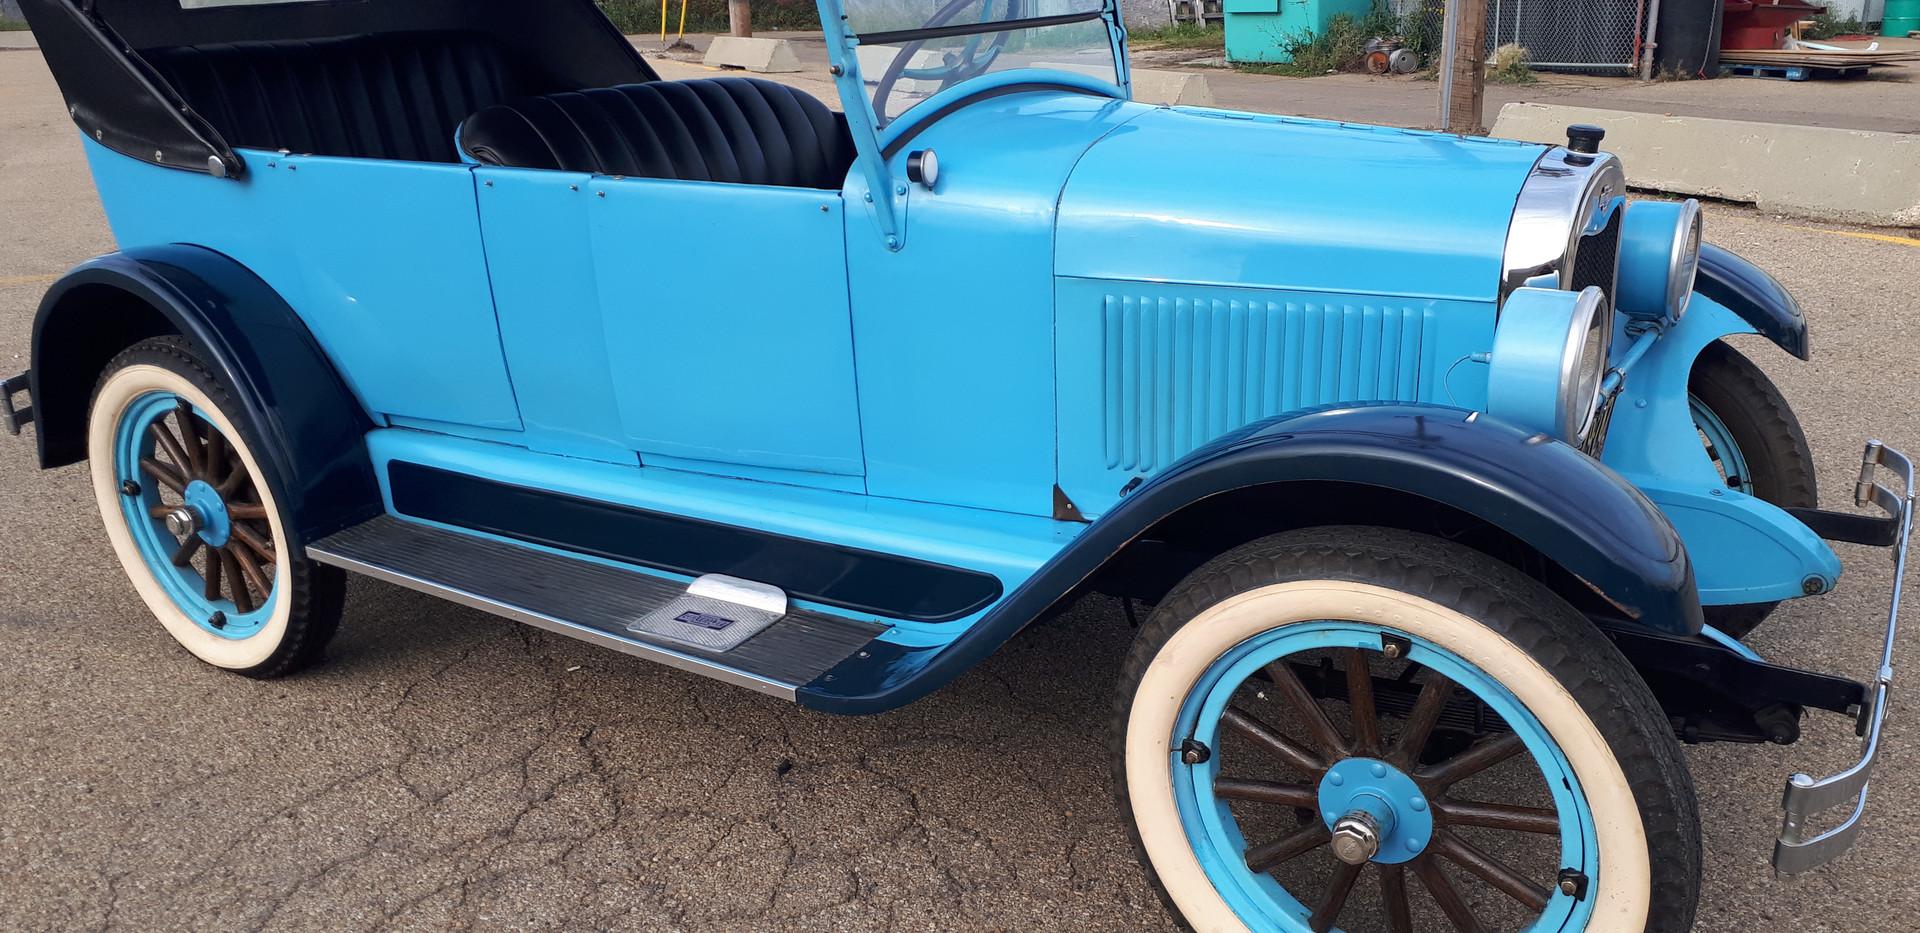 1925 Chevrolet Touring Convertible